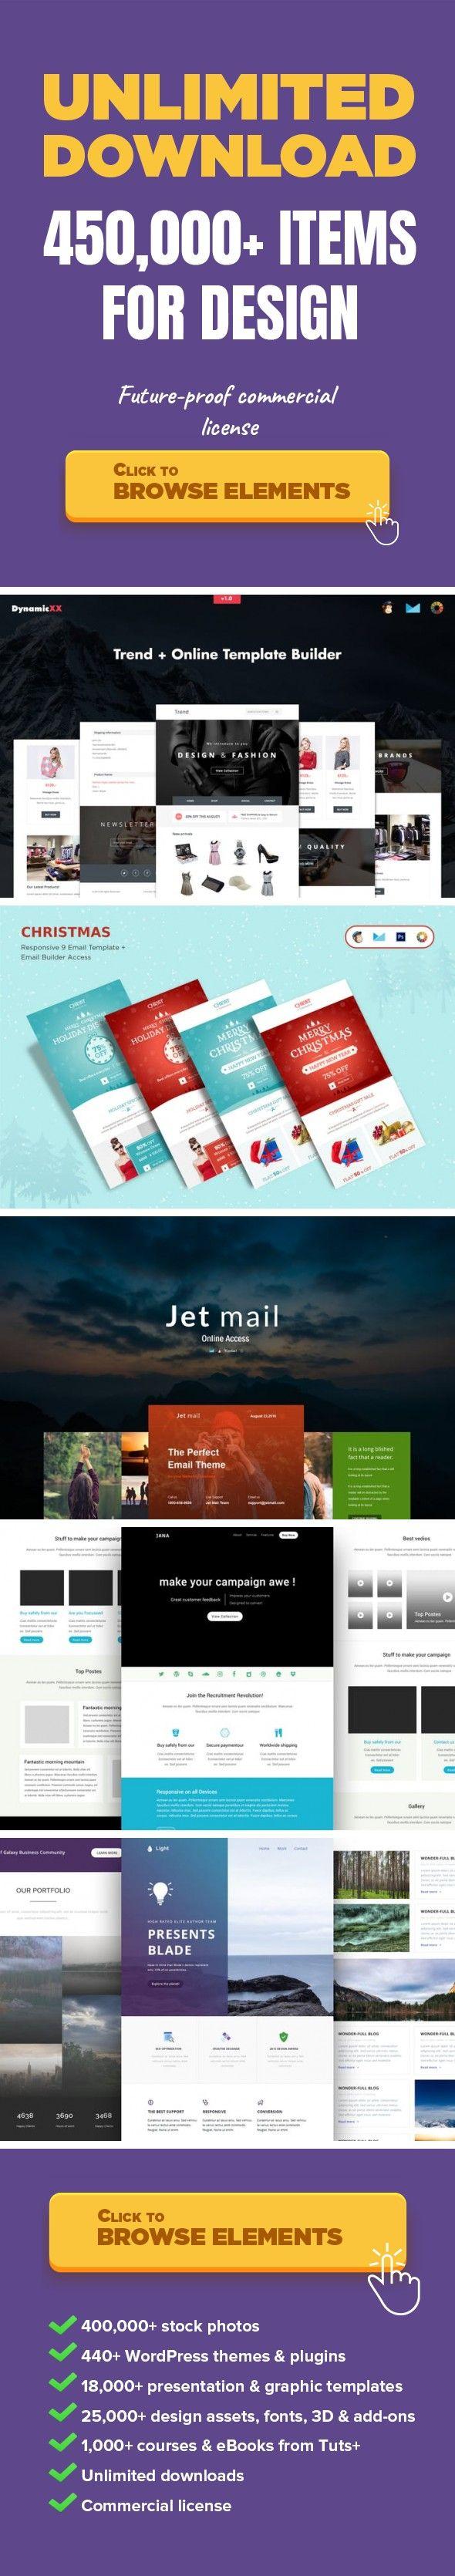 Trend Responsive Fashion Email Online Builder Web Templates - Buy mailchimp templates